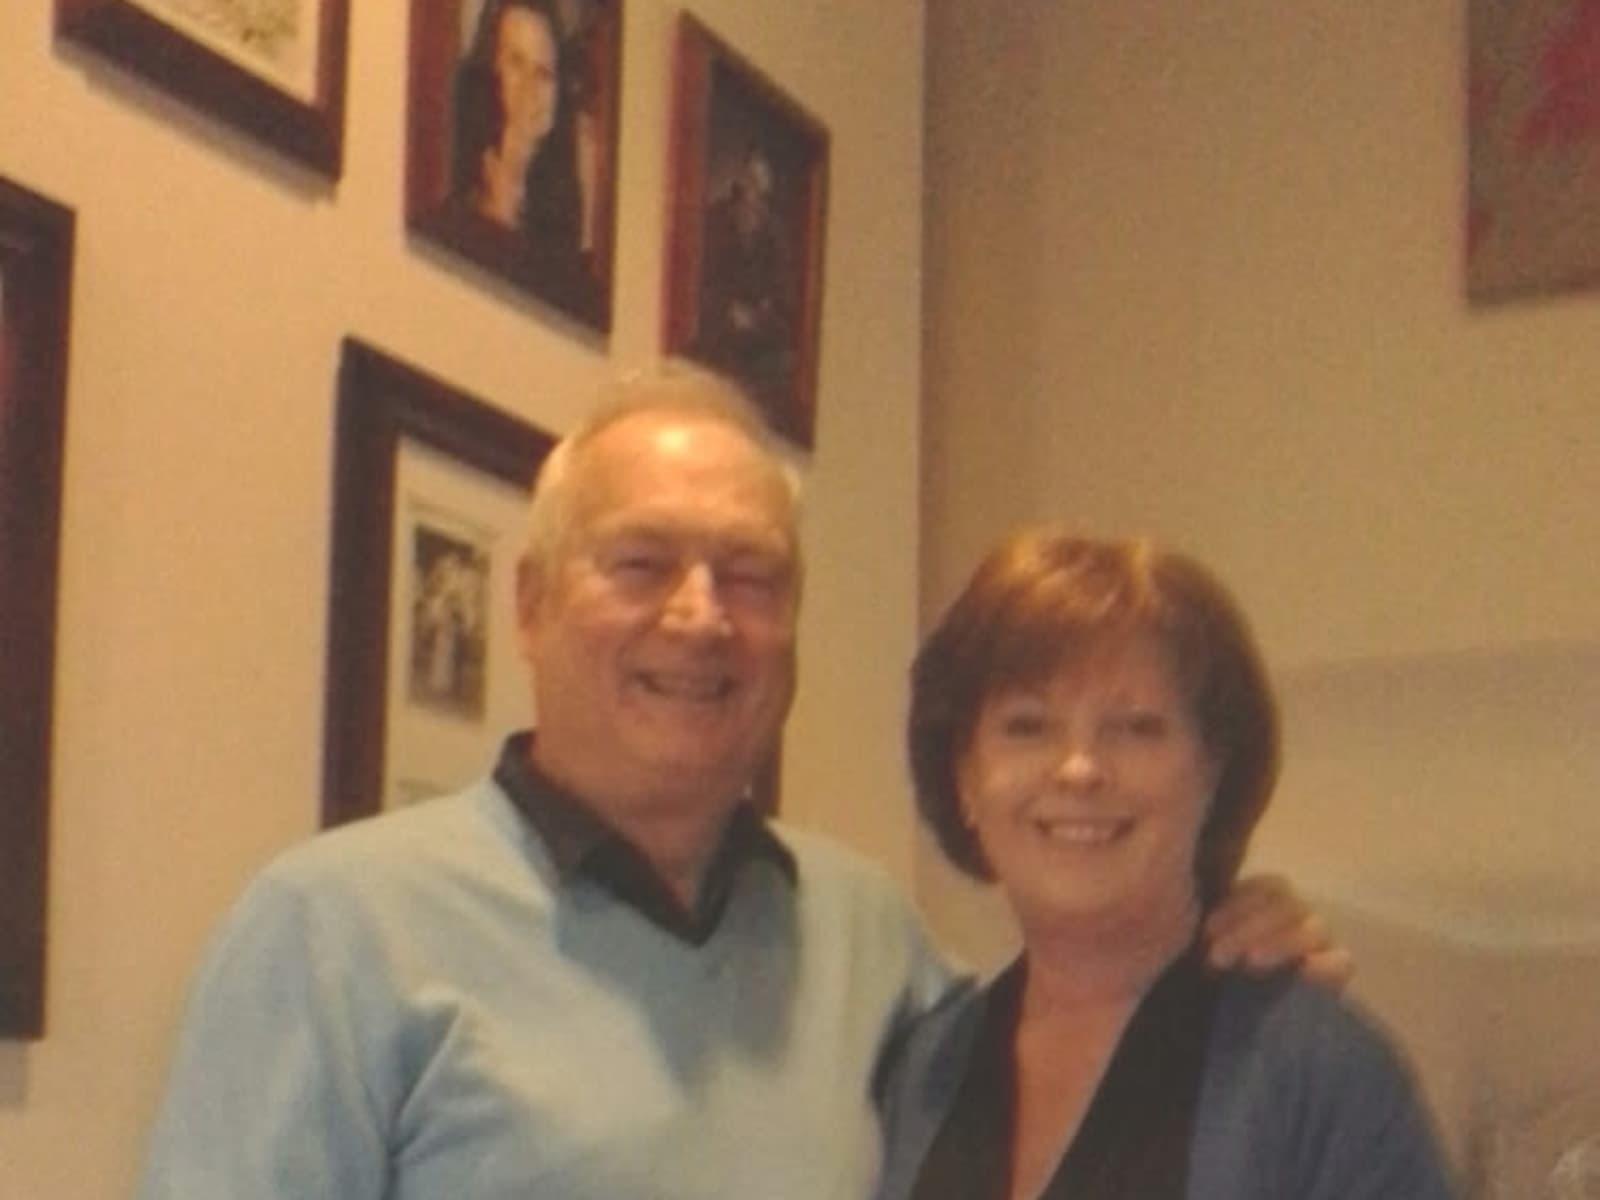 Janice & Brian from Hobart, Tasmania, Australia